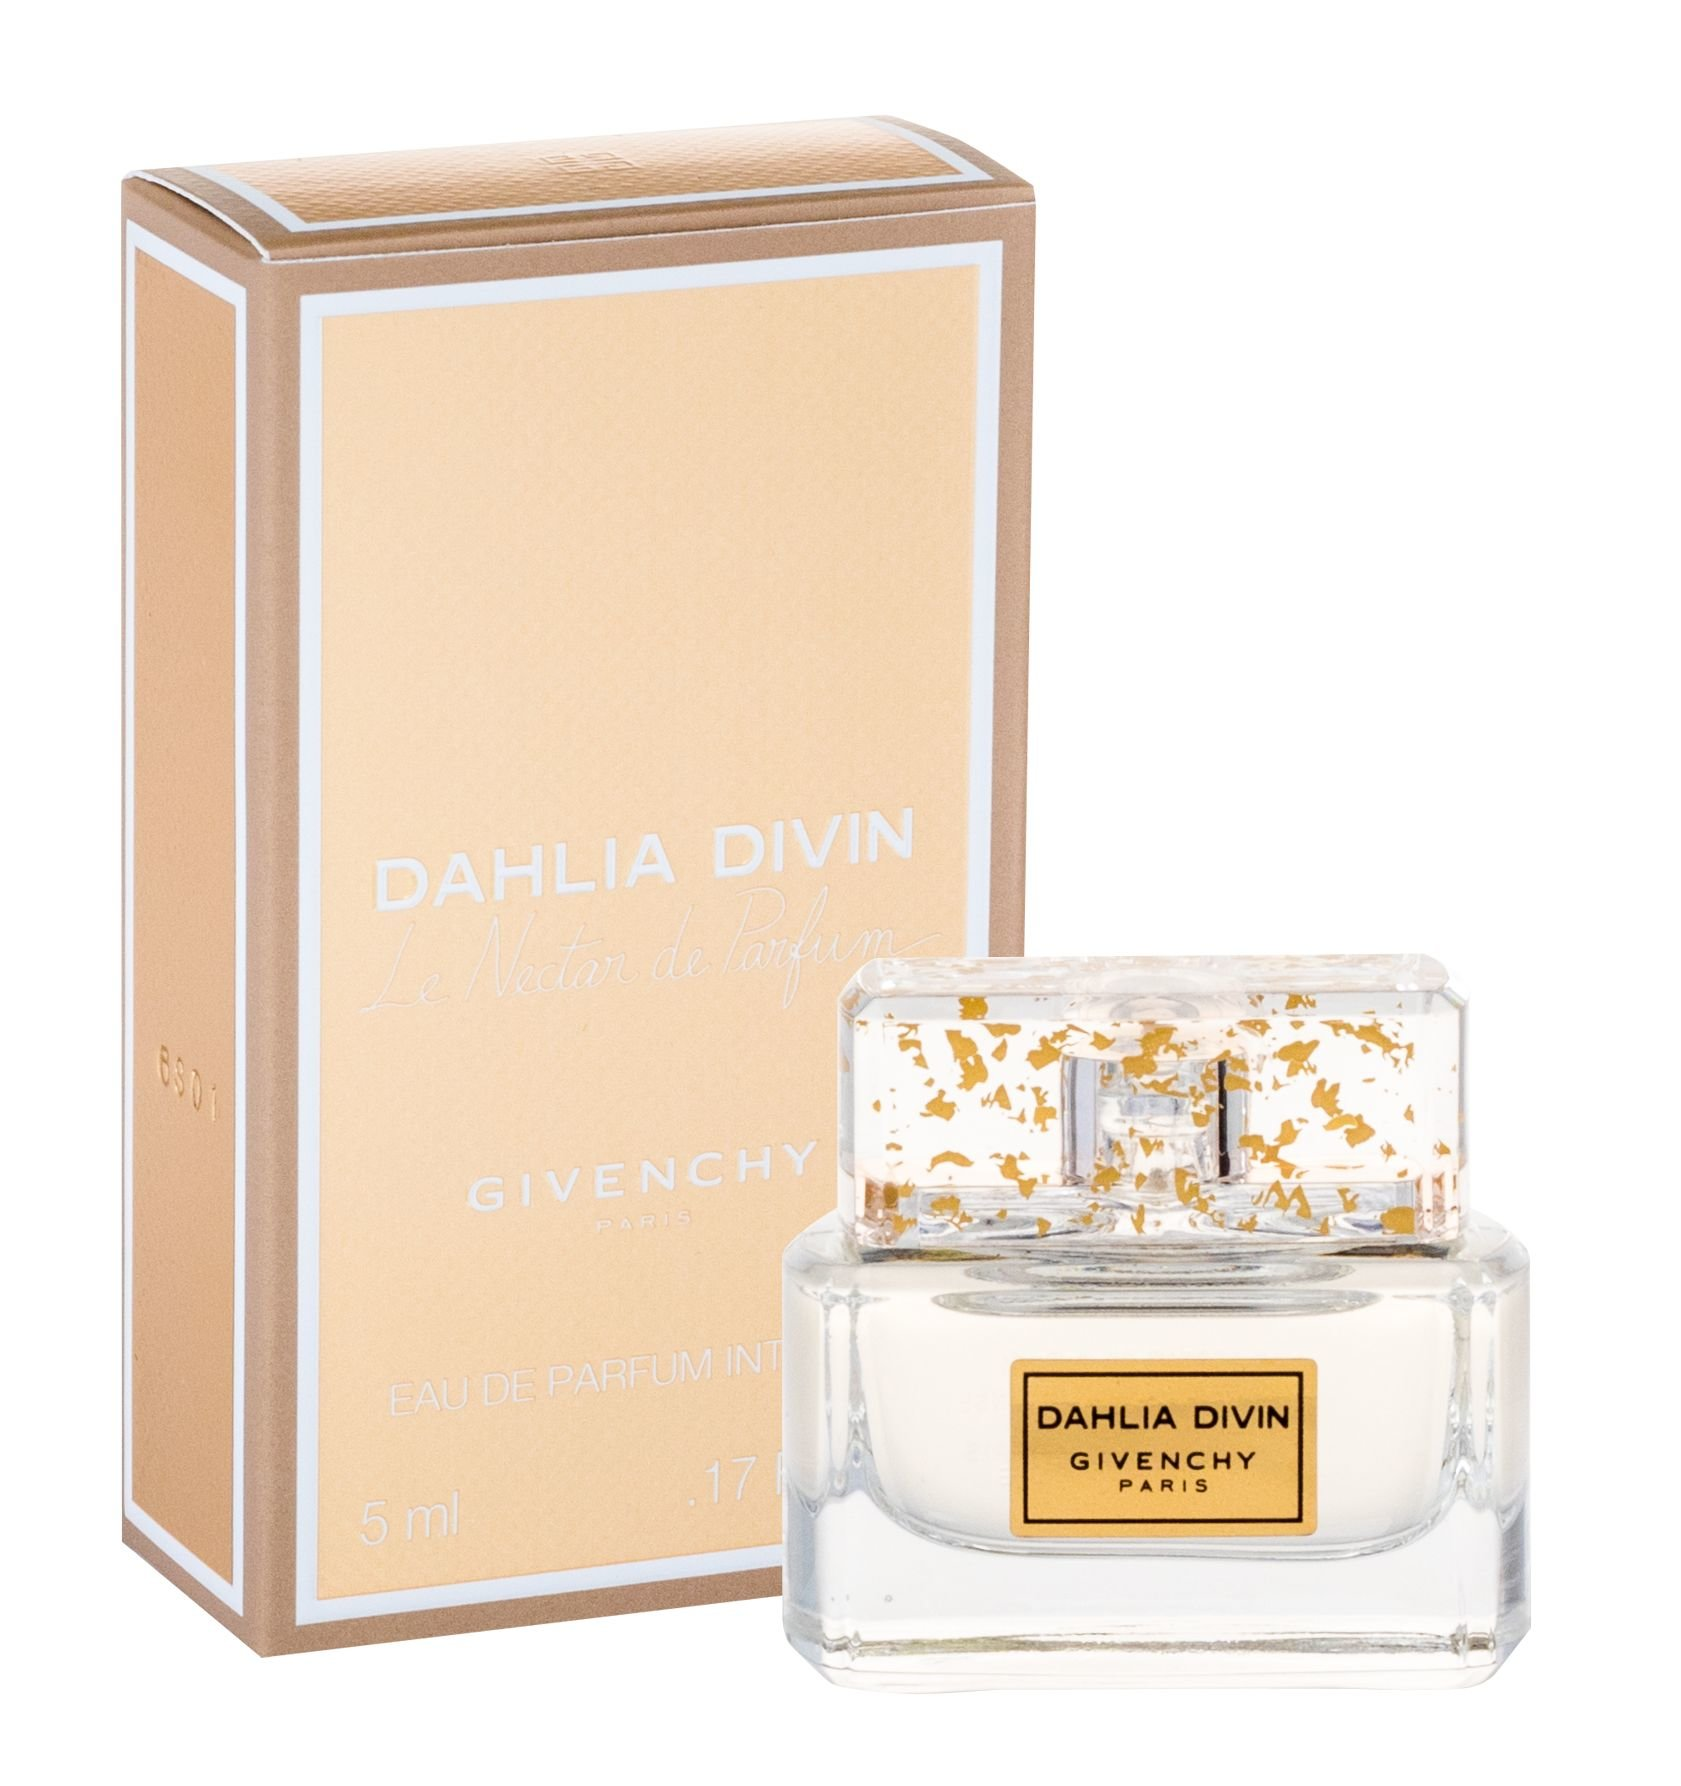 Givenchy Dahlia Divin Le Nectar de Parfum EDP 5ml